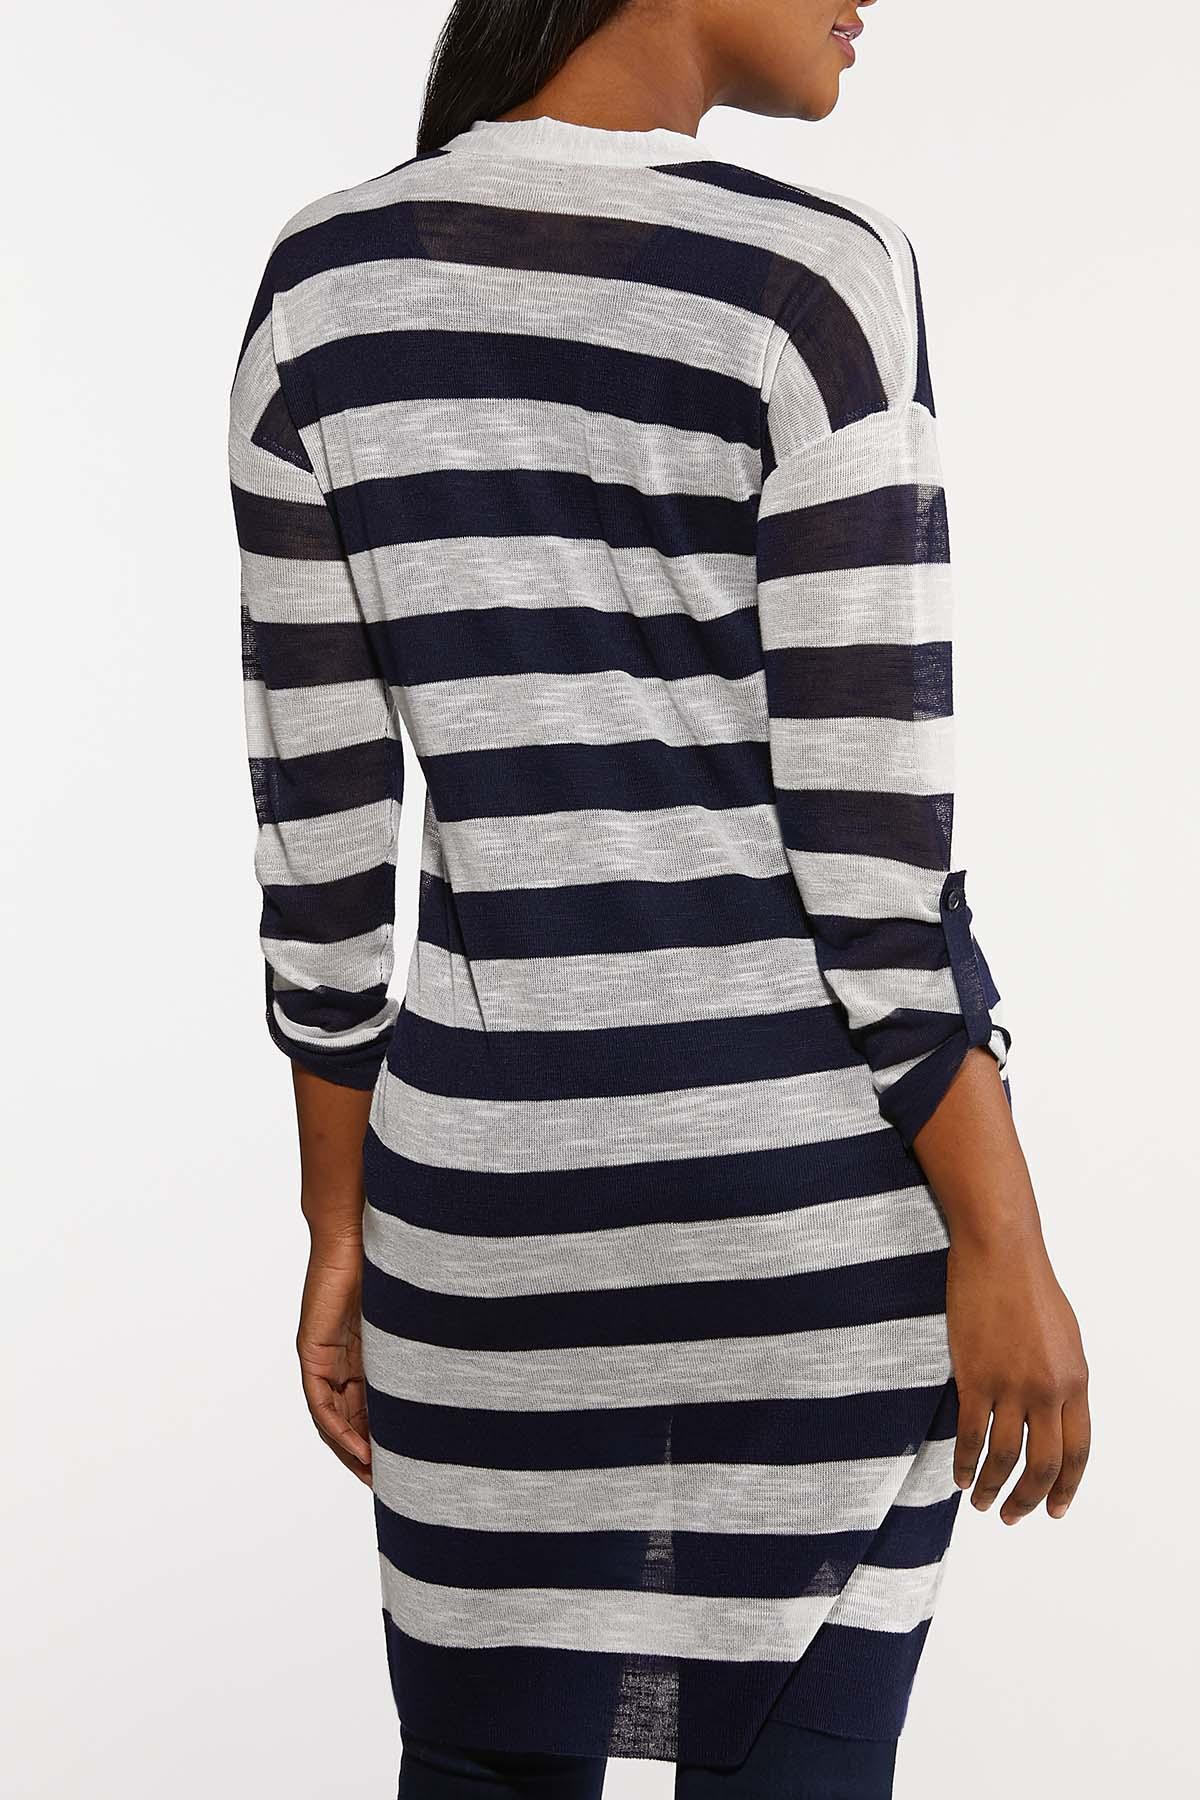 Plus Size Navy Stripe Cardigan Sweater (Item #44195133)